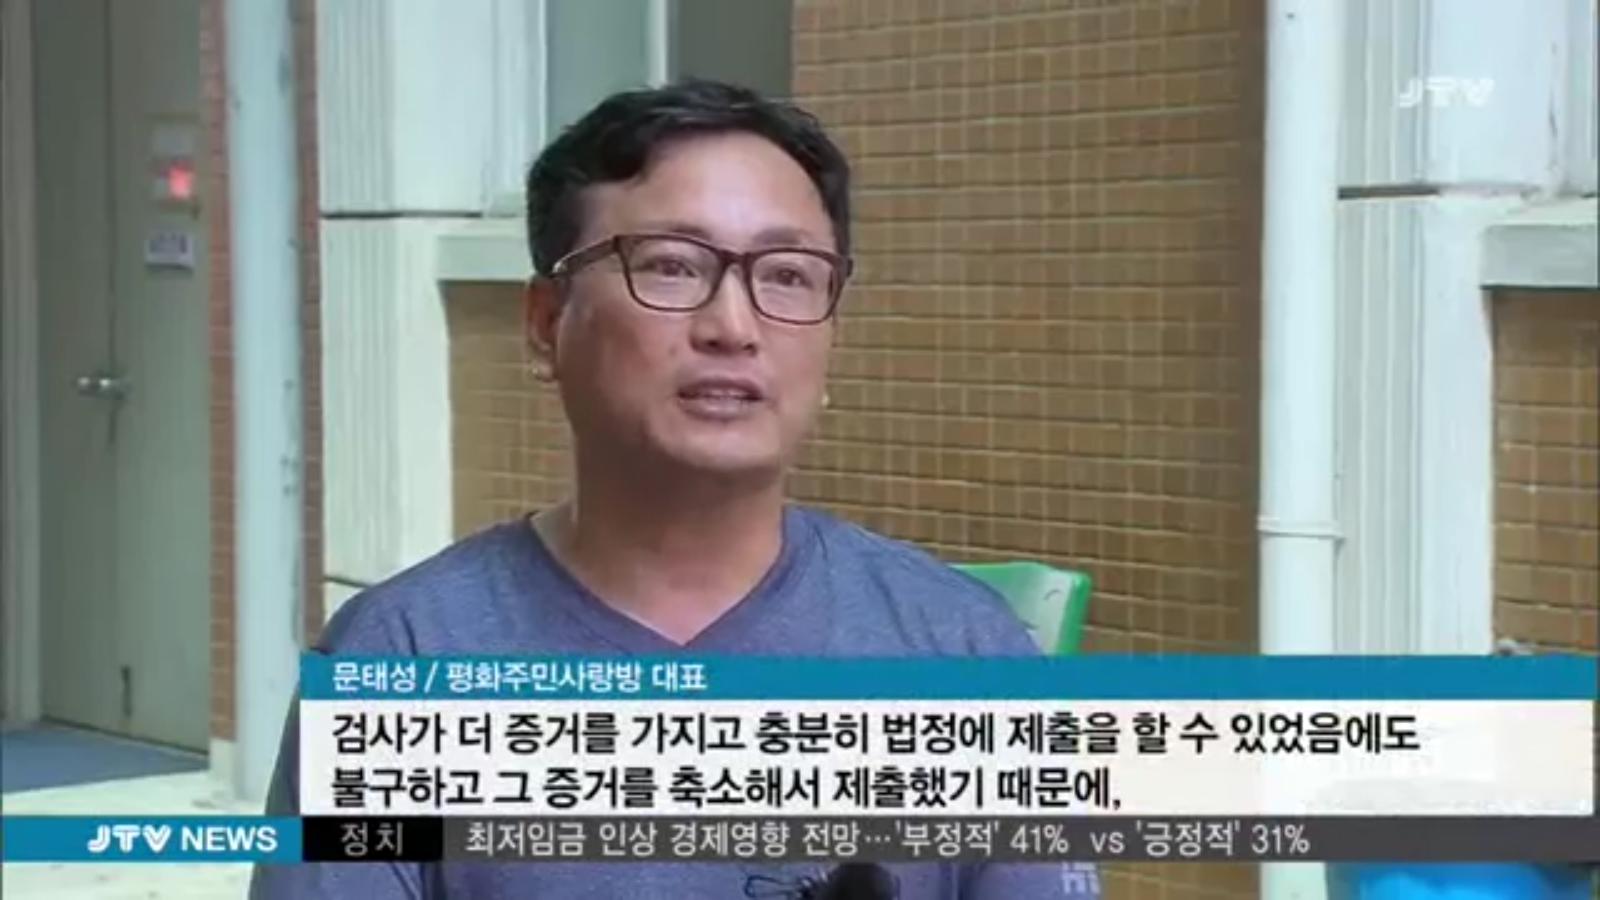 [18.7.20 JTV] 전주 봉침게이트, 검찰은 기소축소... 법원은 재판거래...4.jpg